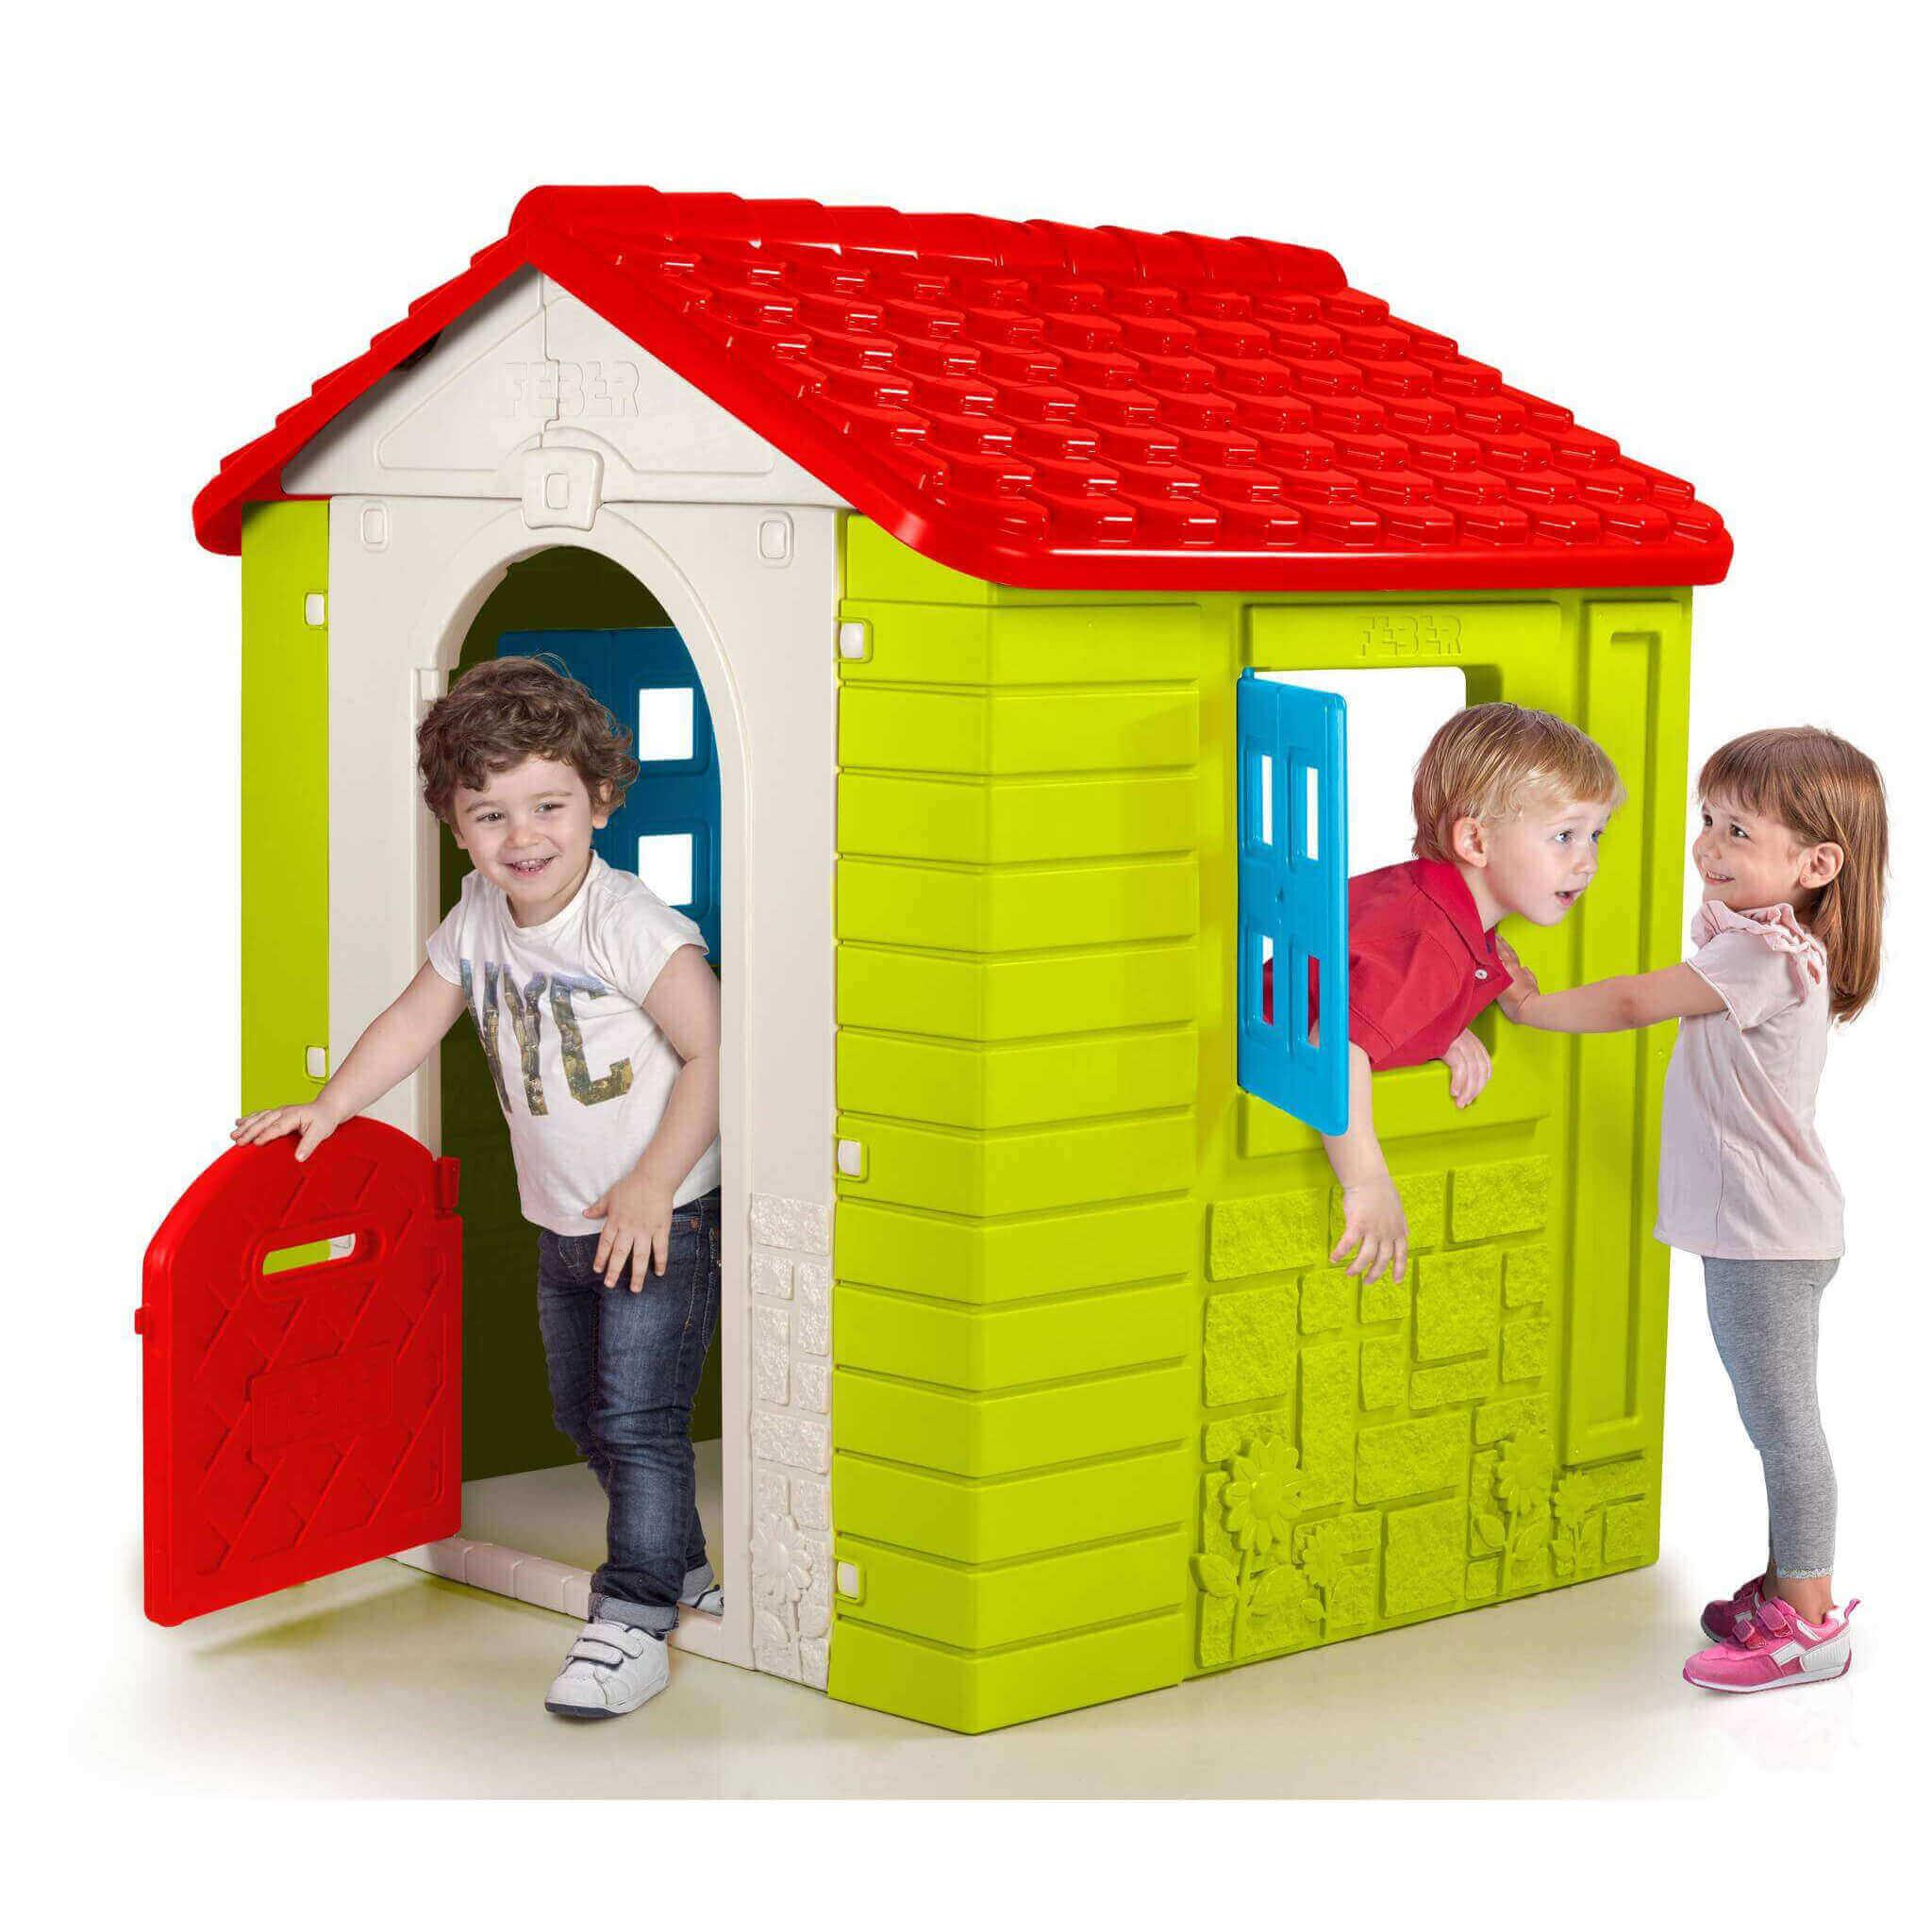 milani home wonder - casetta da giardino per bambini